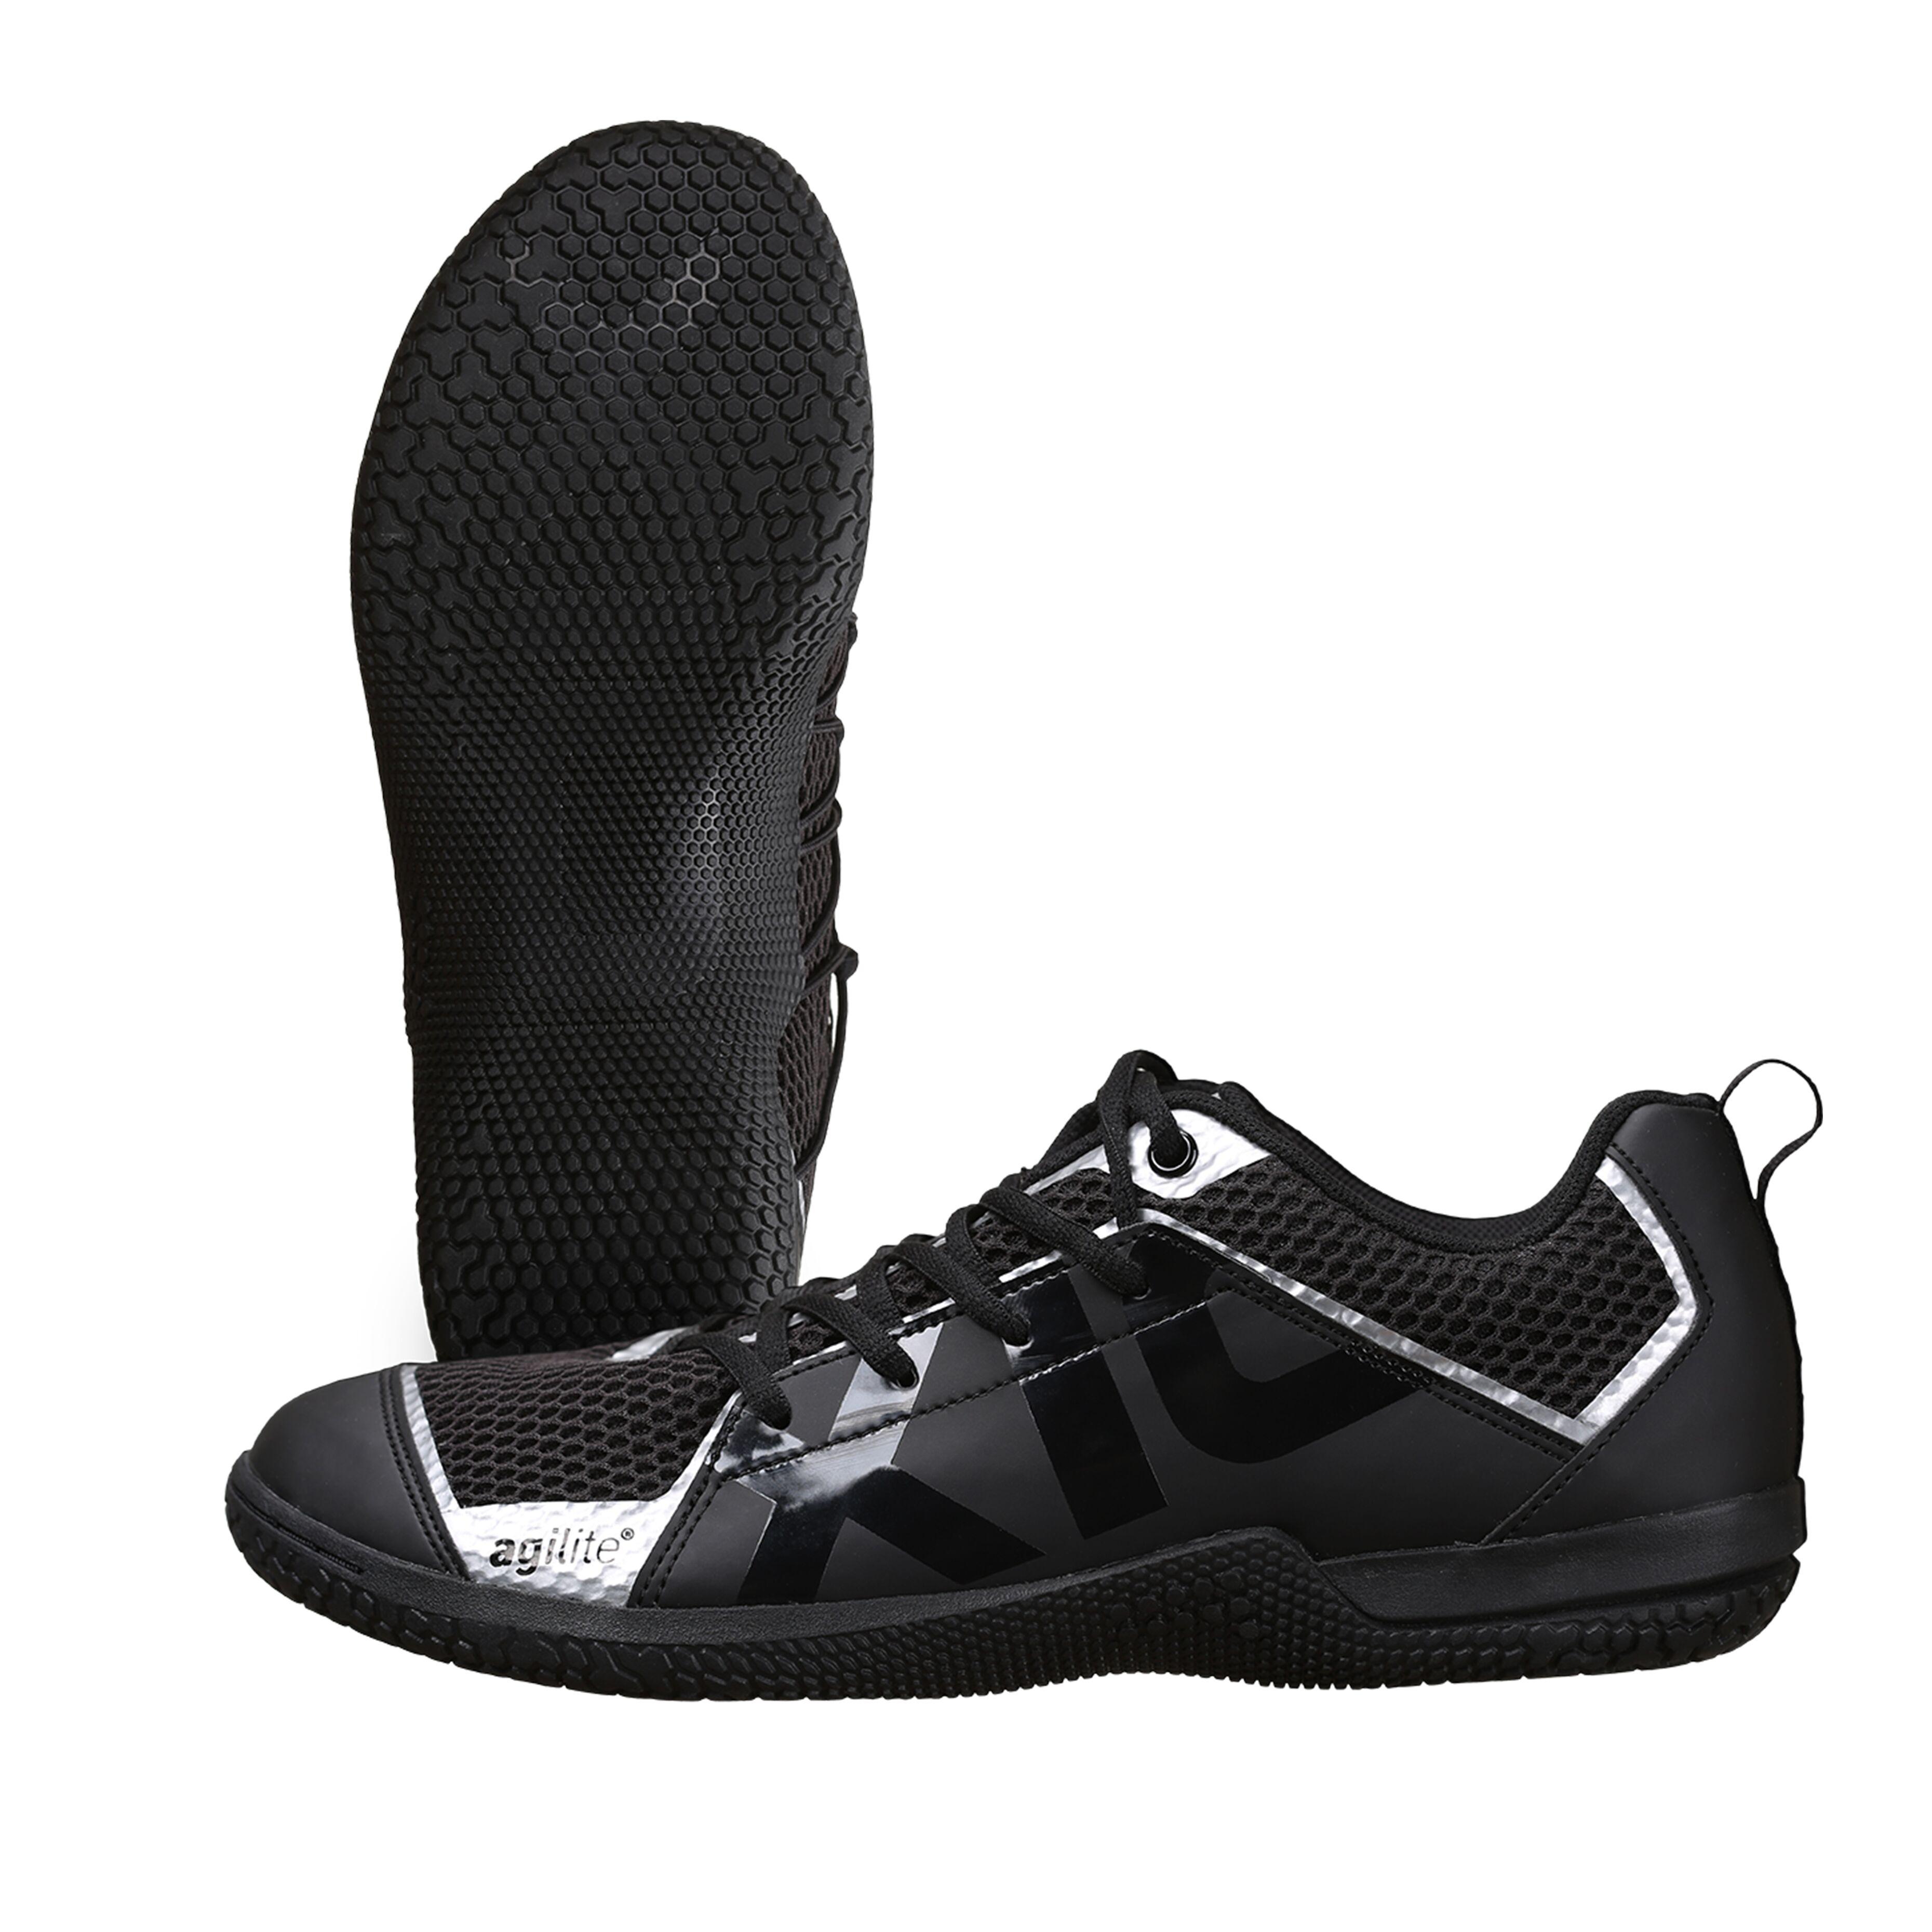 Fabulous Xiom Footwork 2 Professional Table Tennis Shoes Black Silver Uk 6 11 Interior Design Ideas Oteneahmetsinanyavuzinfo